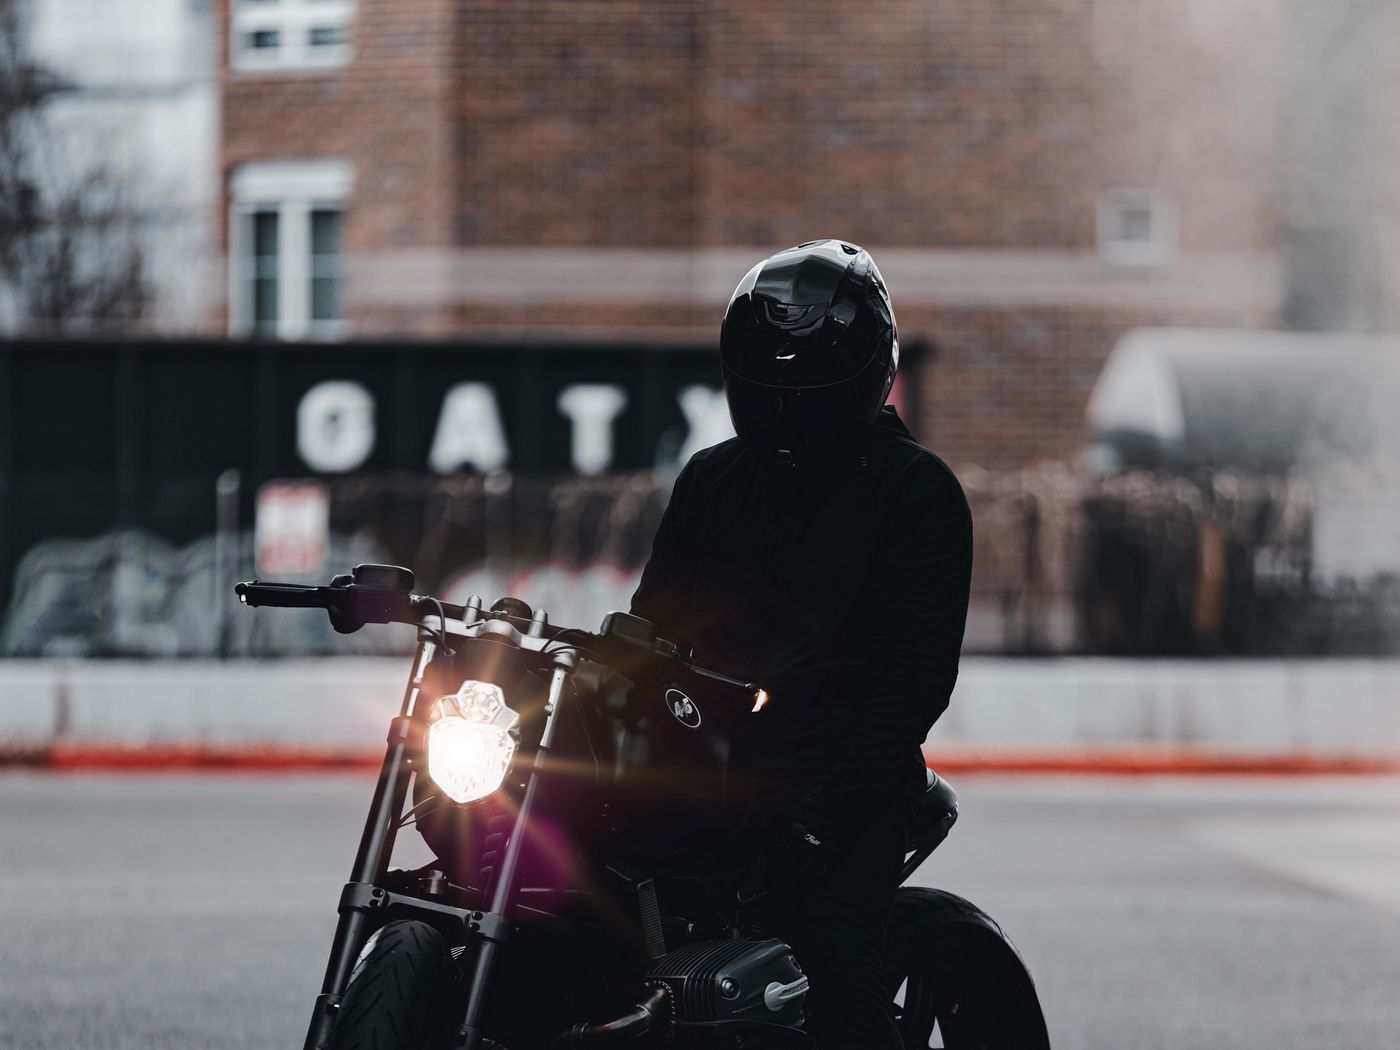 1400x1050 Обои мотоцикл, байк, мотоциклист, черный, свет, дорога